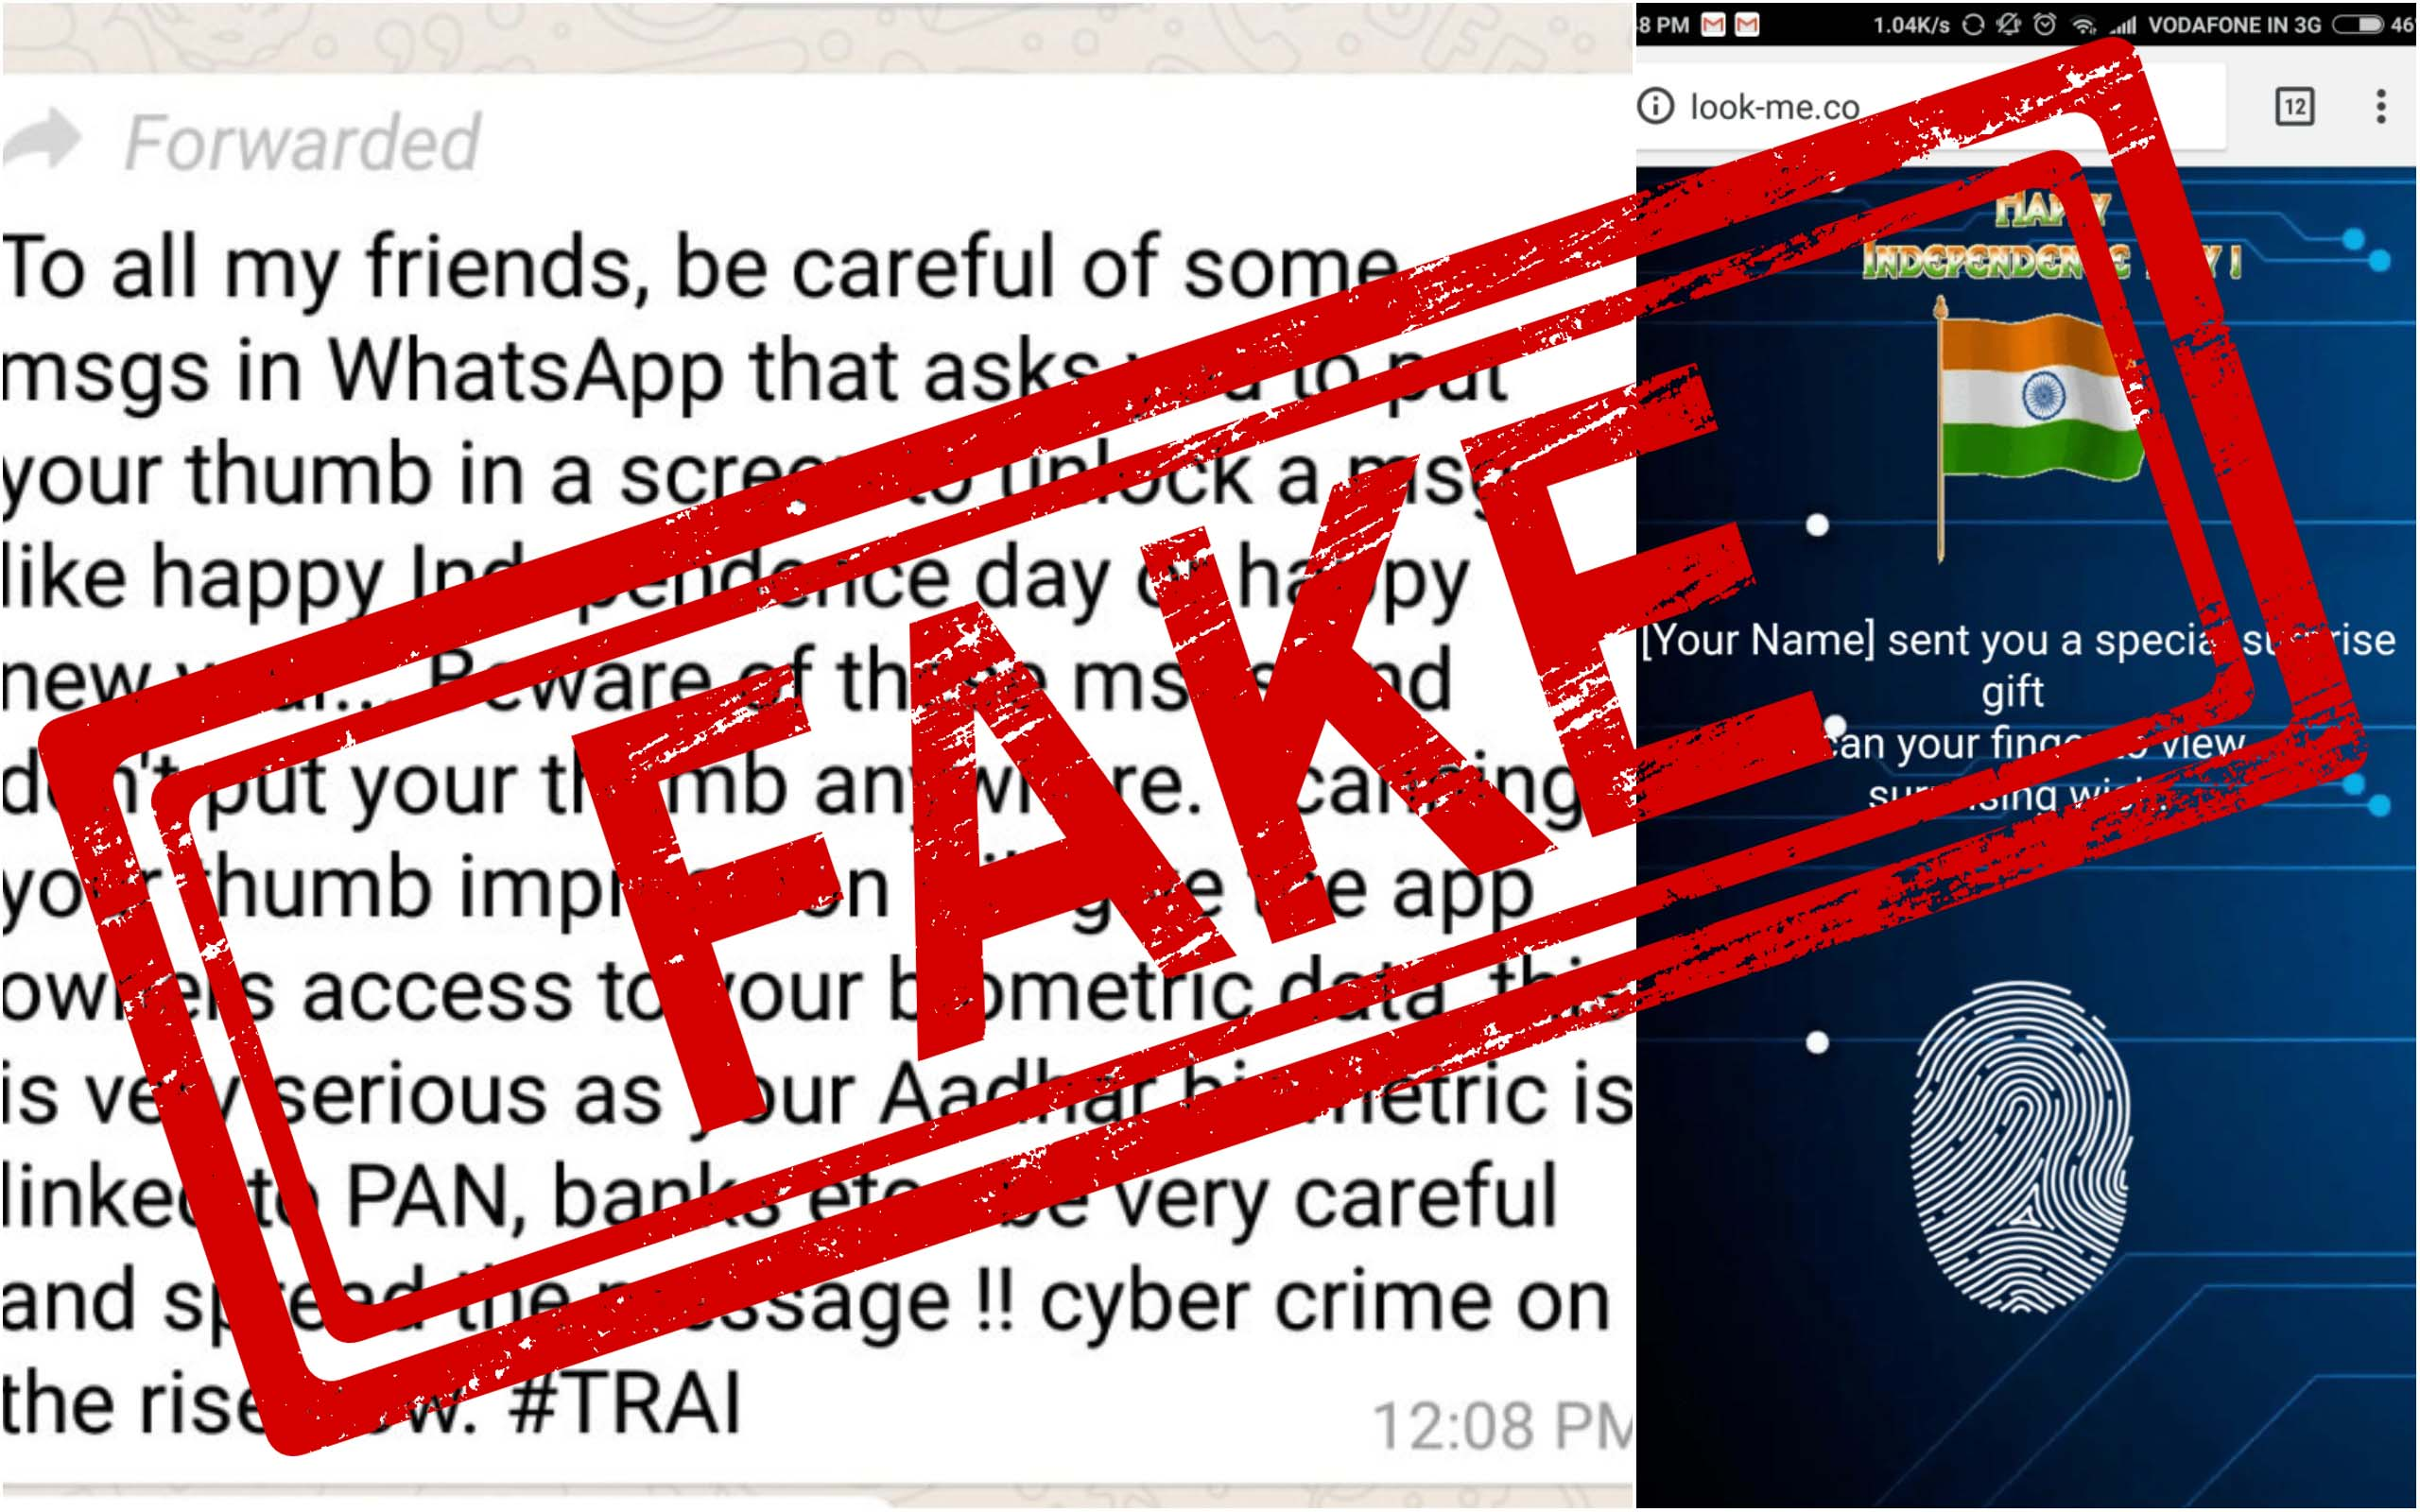 Independence Day, Forward, WhatsApp, Fake, Fake News, Fact Checker, NewsMobile, Mobile News, India